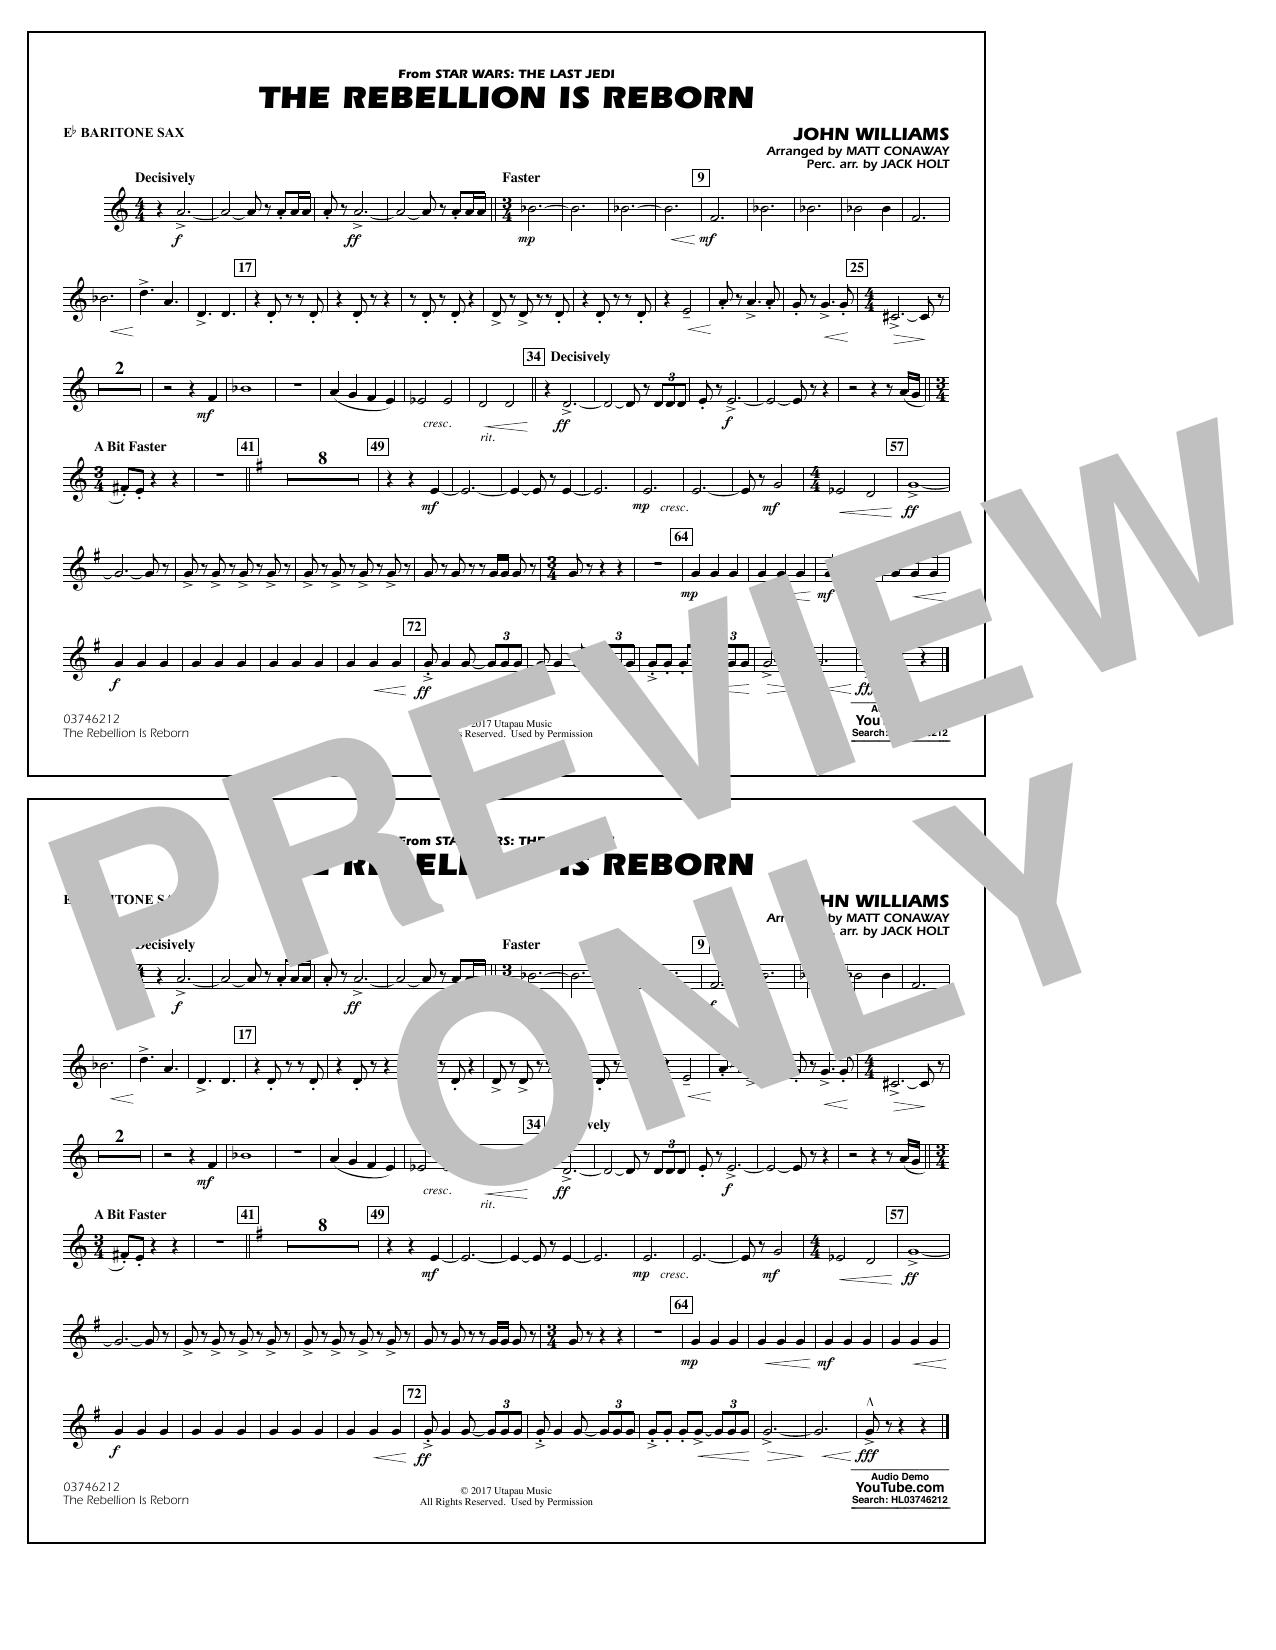 Matt Conaway The Rebellion Is Reborn - Eb Baritone Sax sheet music notes and chords